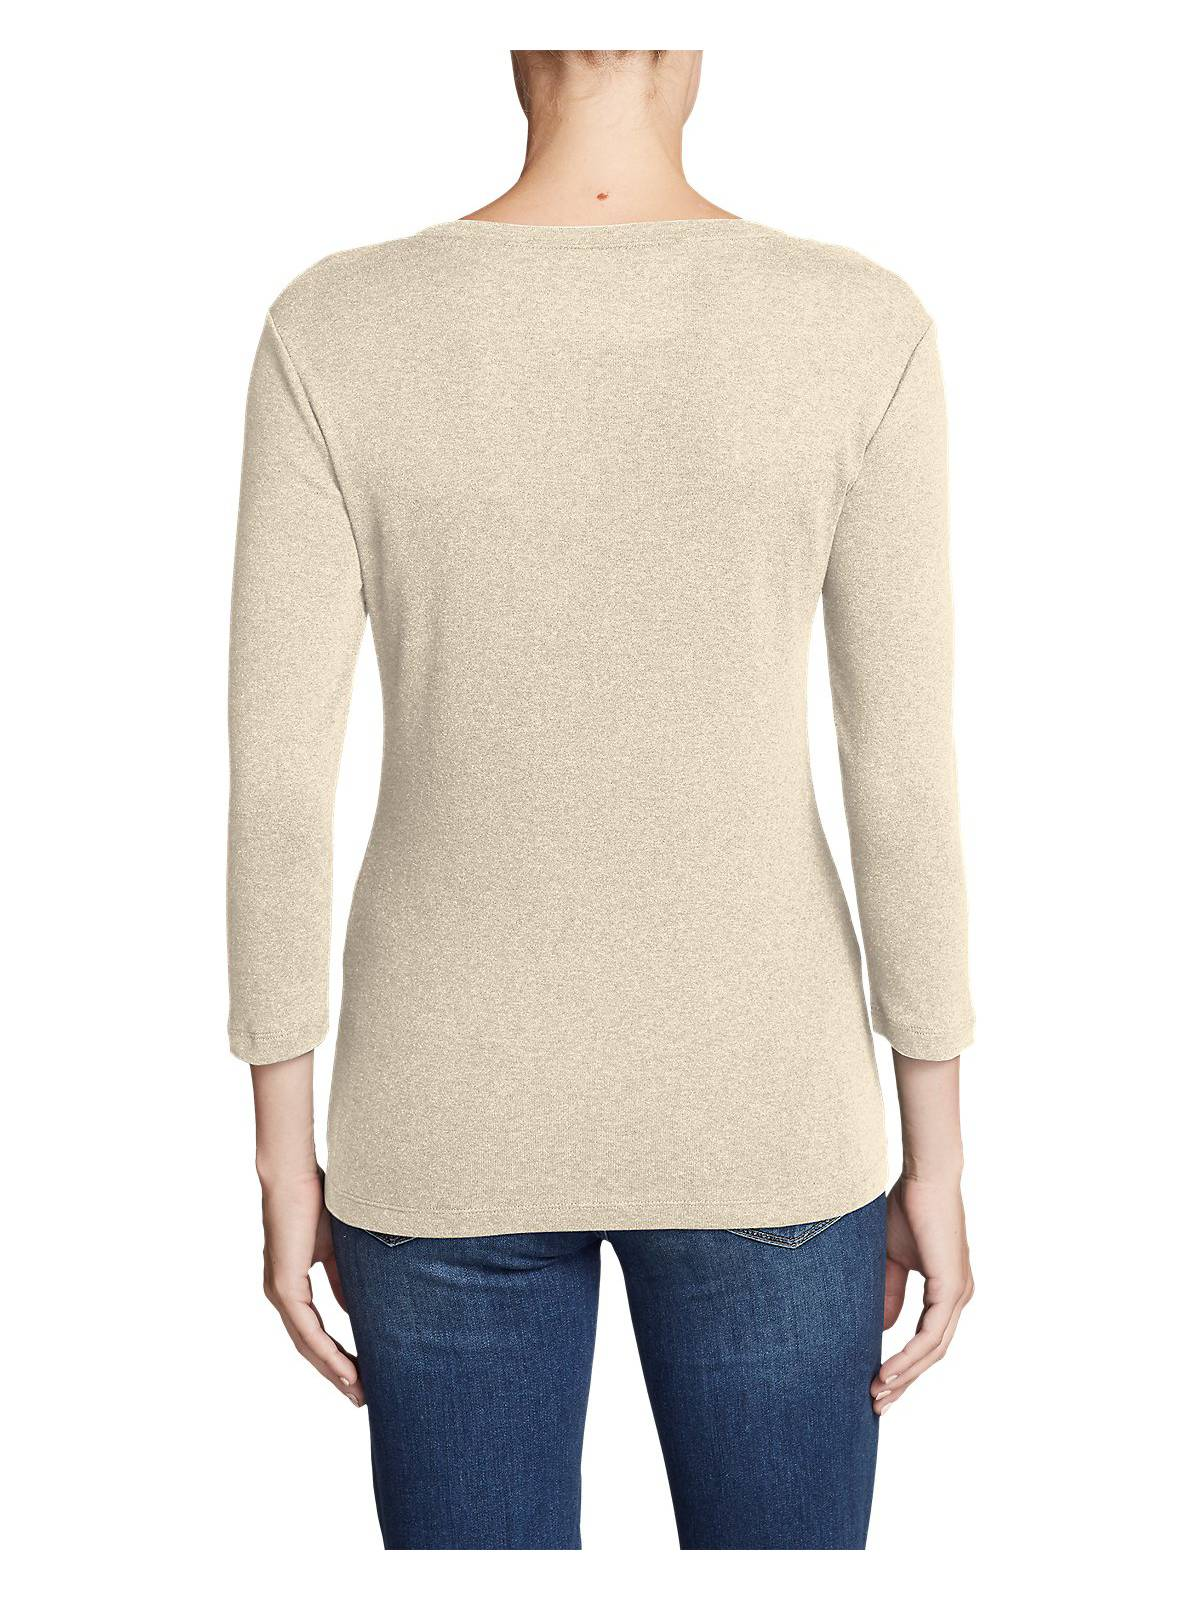 Eddie-Bauer-Women-039-s-Favorite-3-4-Sleeve-Scoop-Neck-T-Shirt thumbnail 11